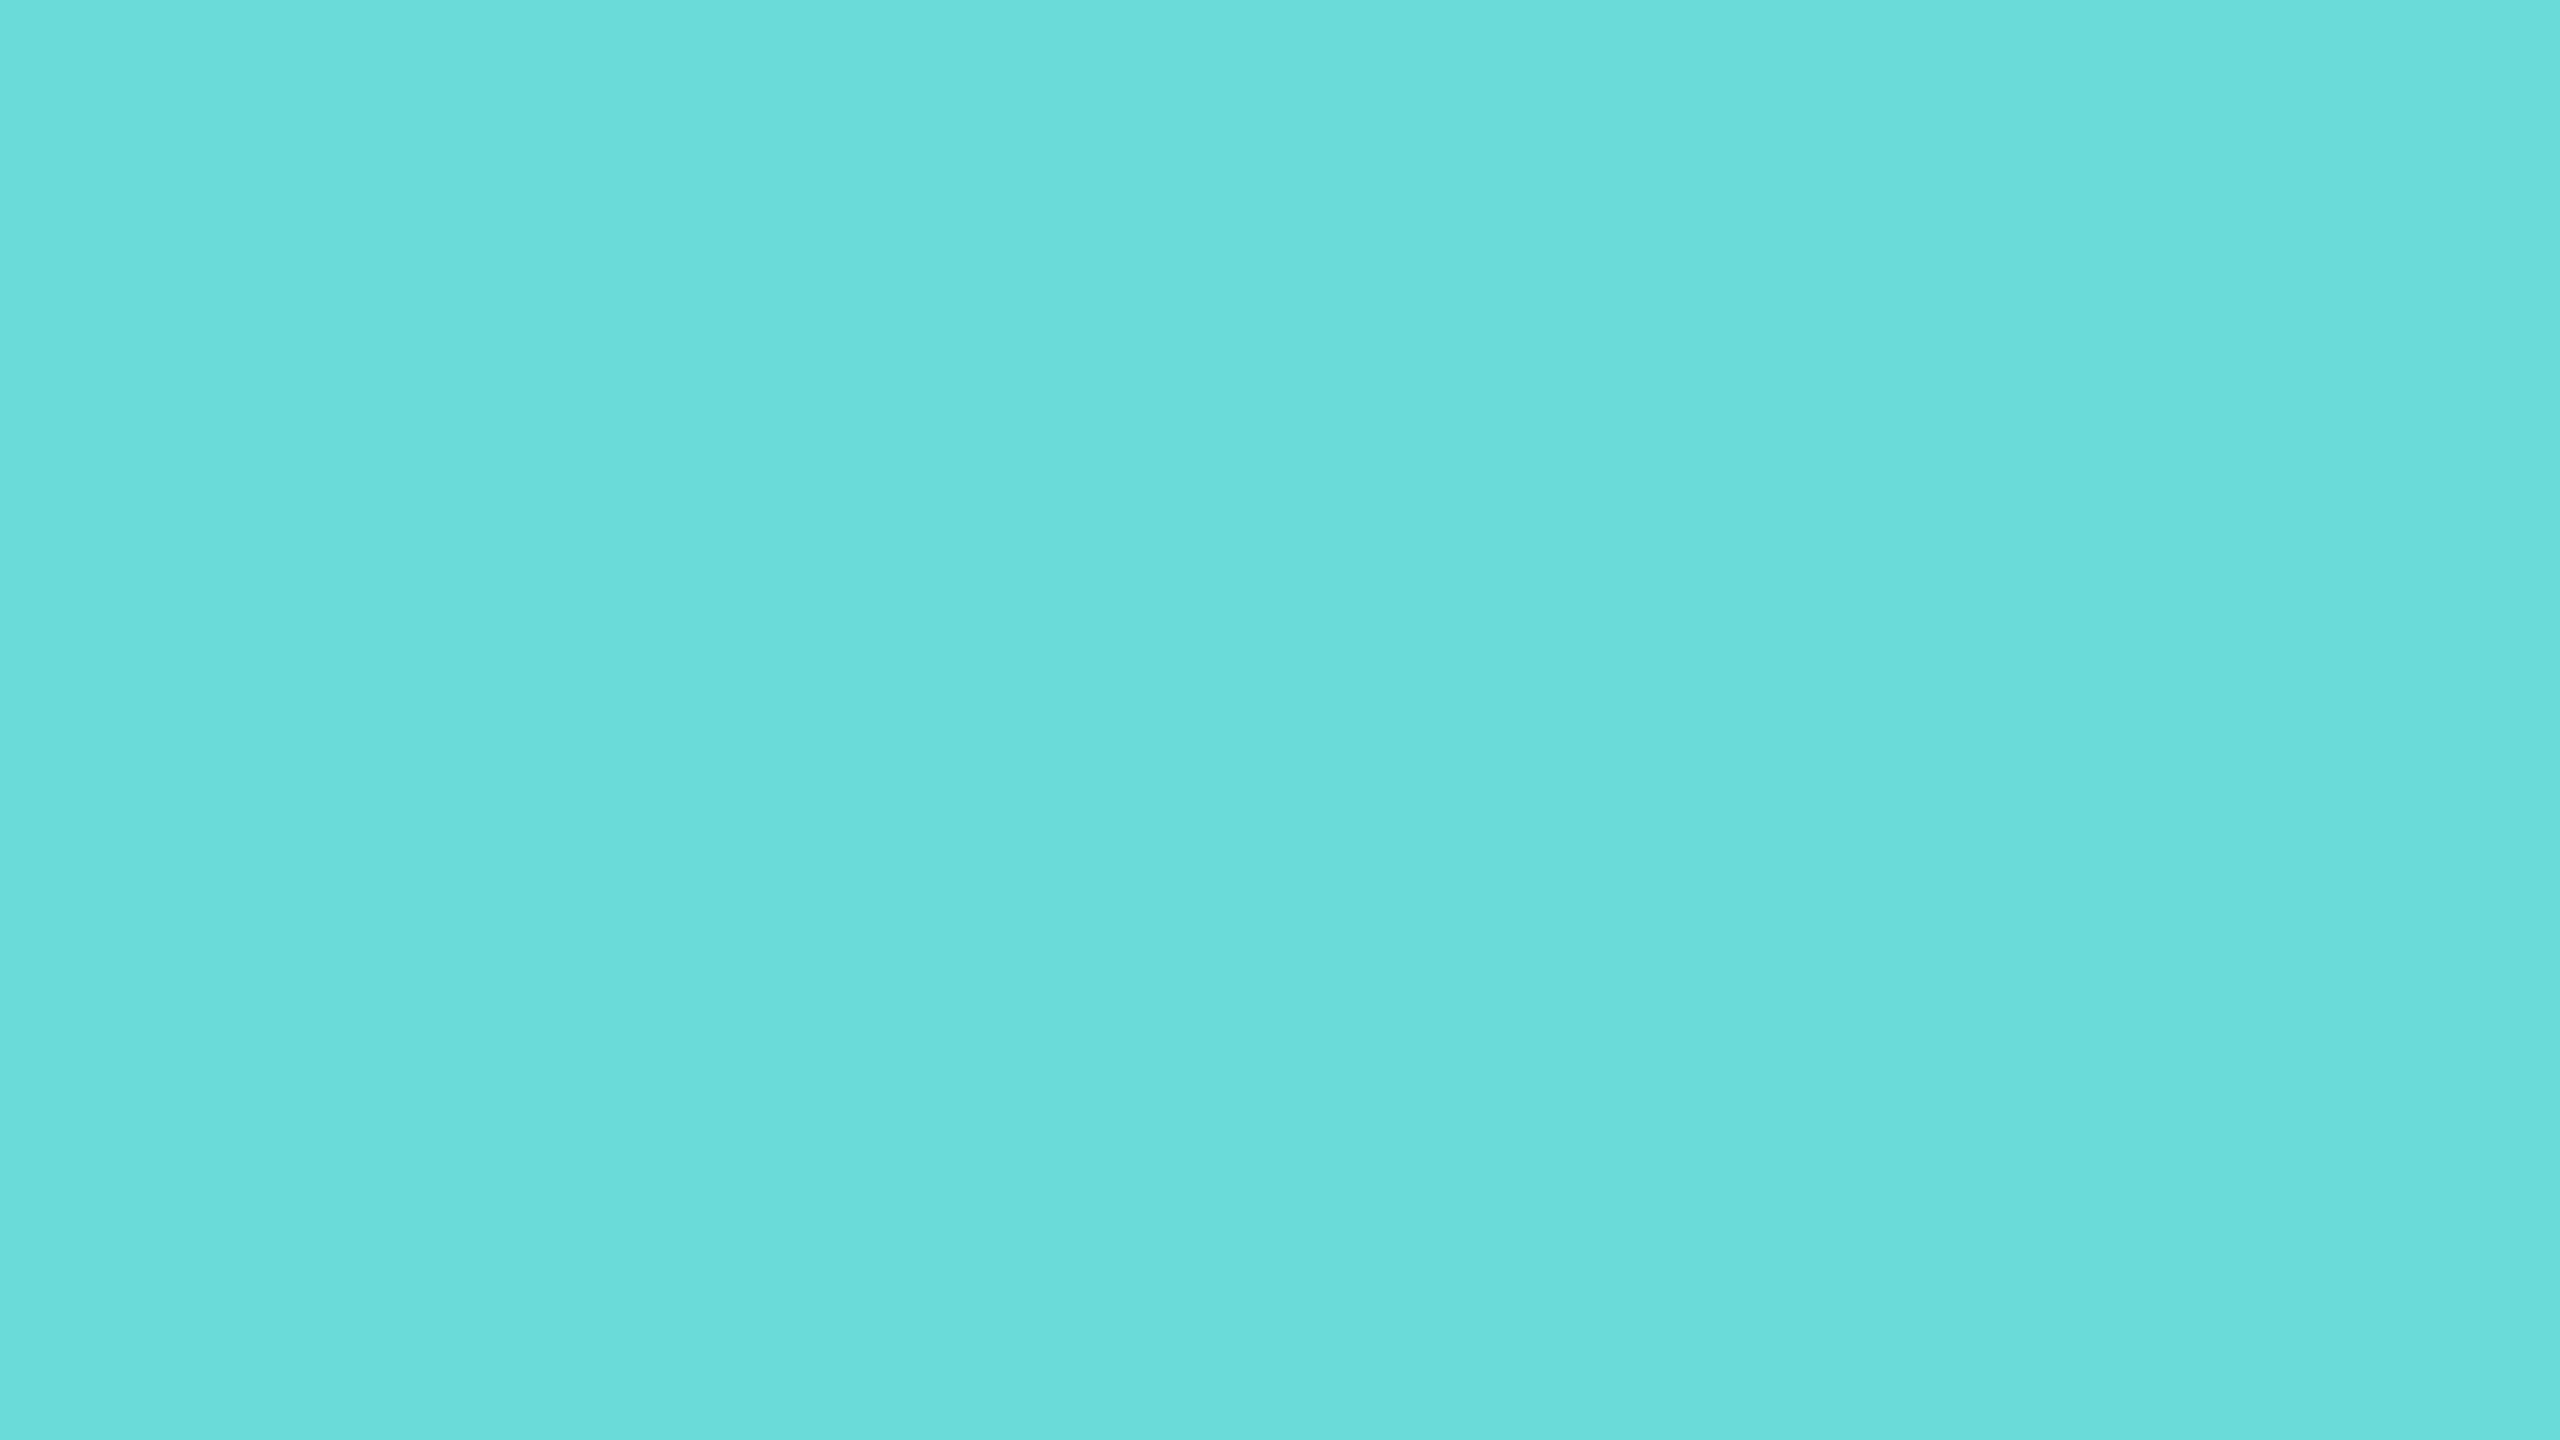 Tiffany Blue Wallpaper - Tiffany Blue PNG